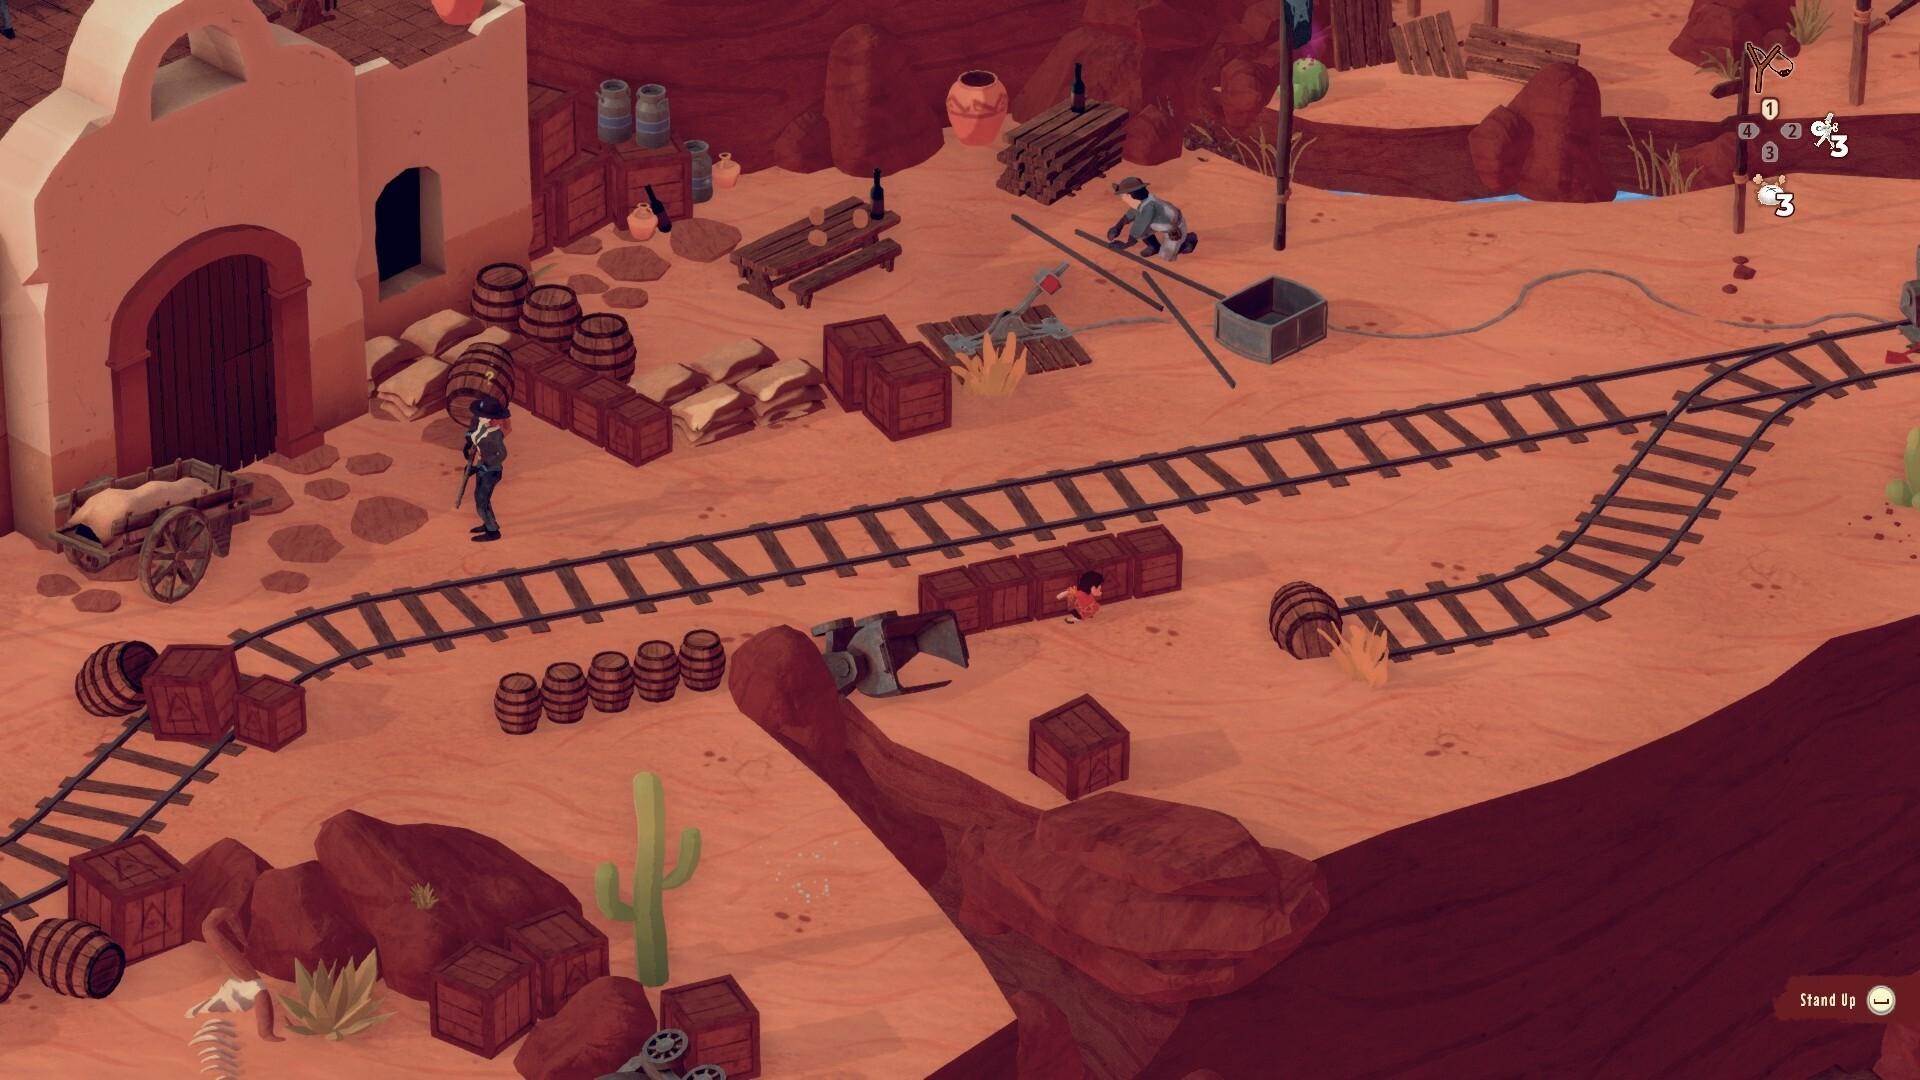 El Hijo - A Wild West Tale game screenshot, desert railroad track